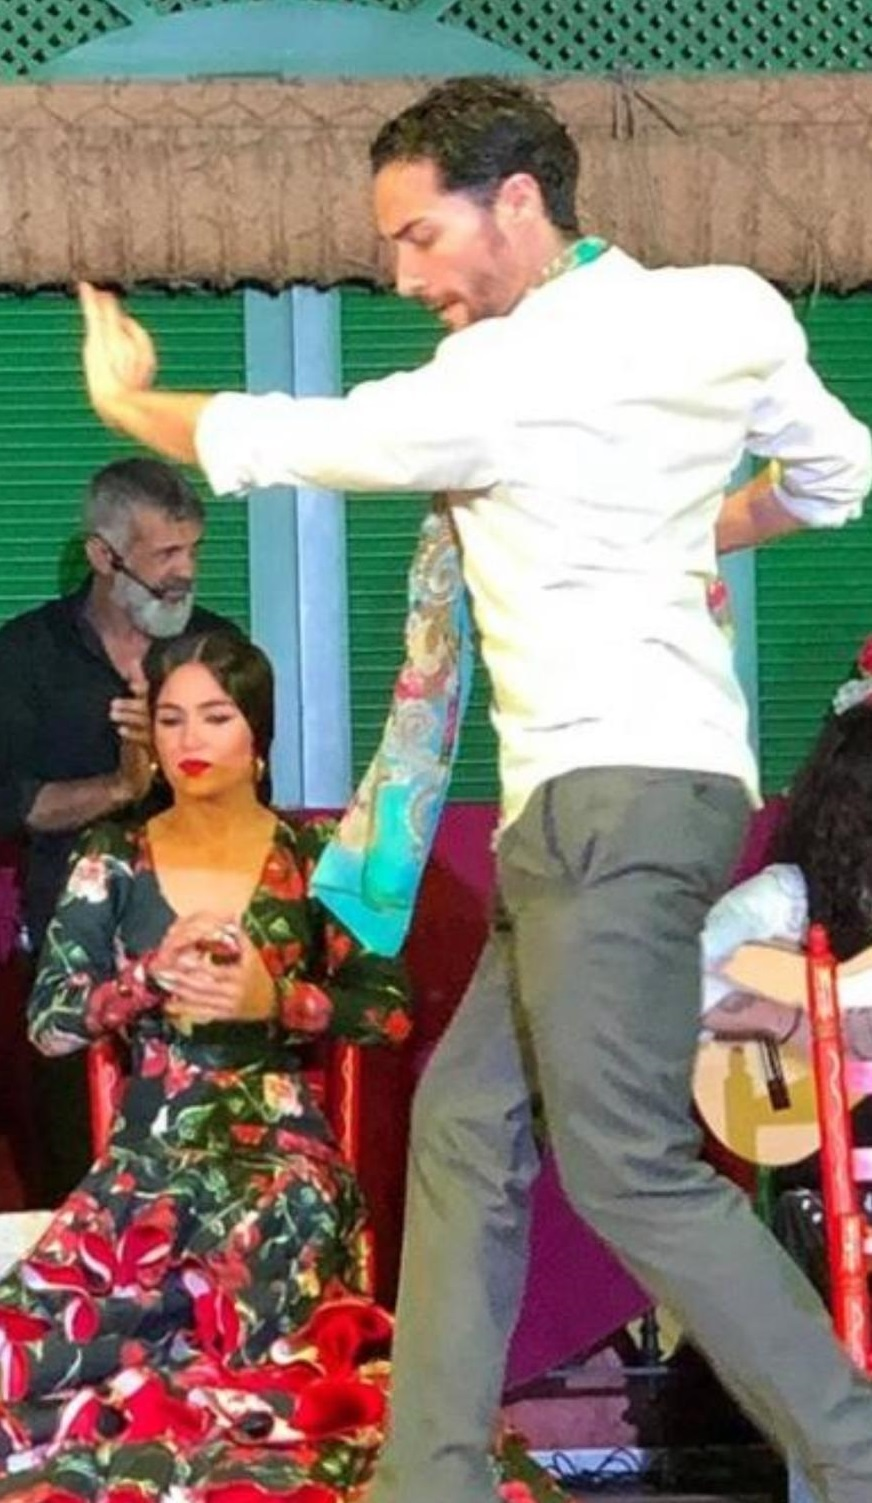 Bailaor de flamenco Antonio Vázquez